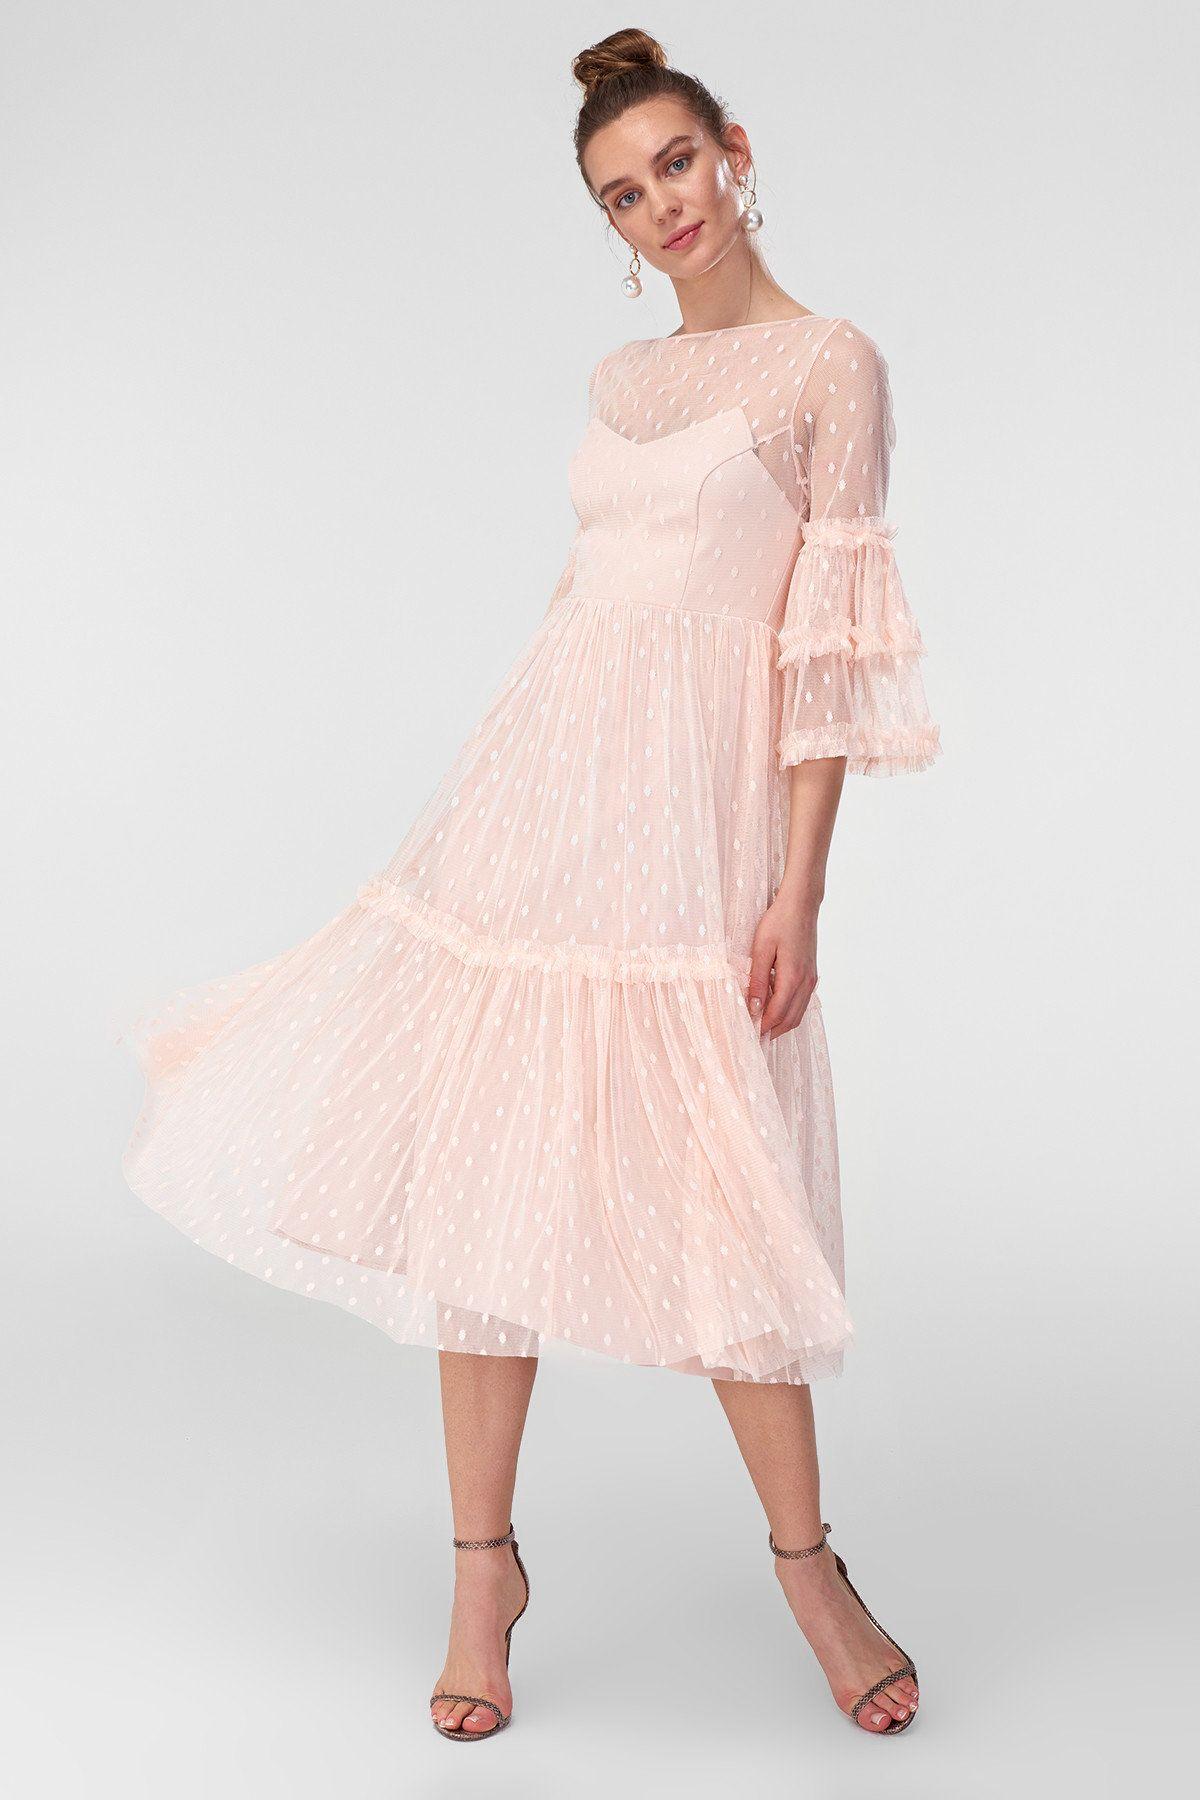 Https Www Trendyol Com Trendyolmilla Pudra Puantiye Tullu Abiye Elbise P 2474882 Boutiqueid 186392 The Dress Elbise Elbiseler